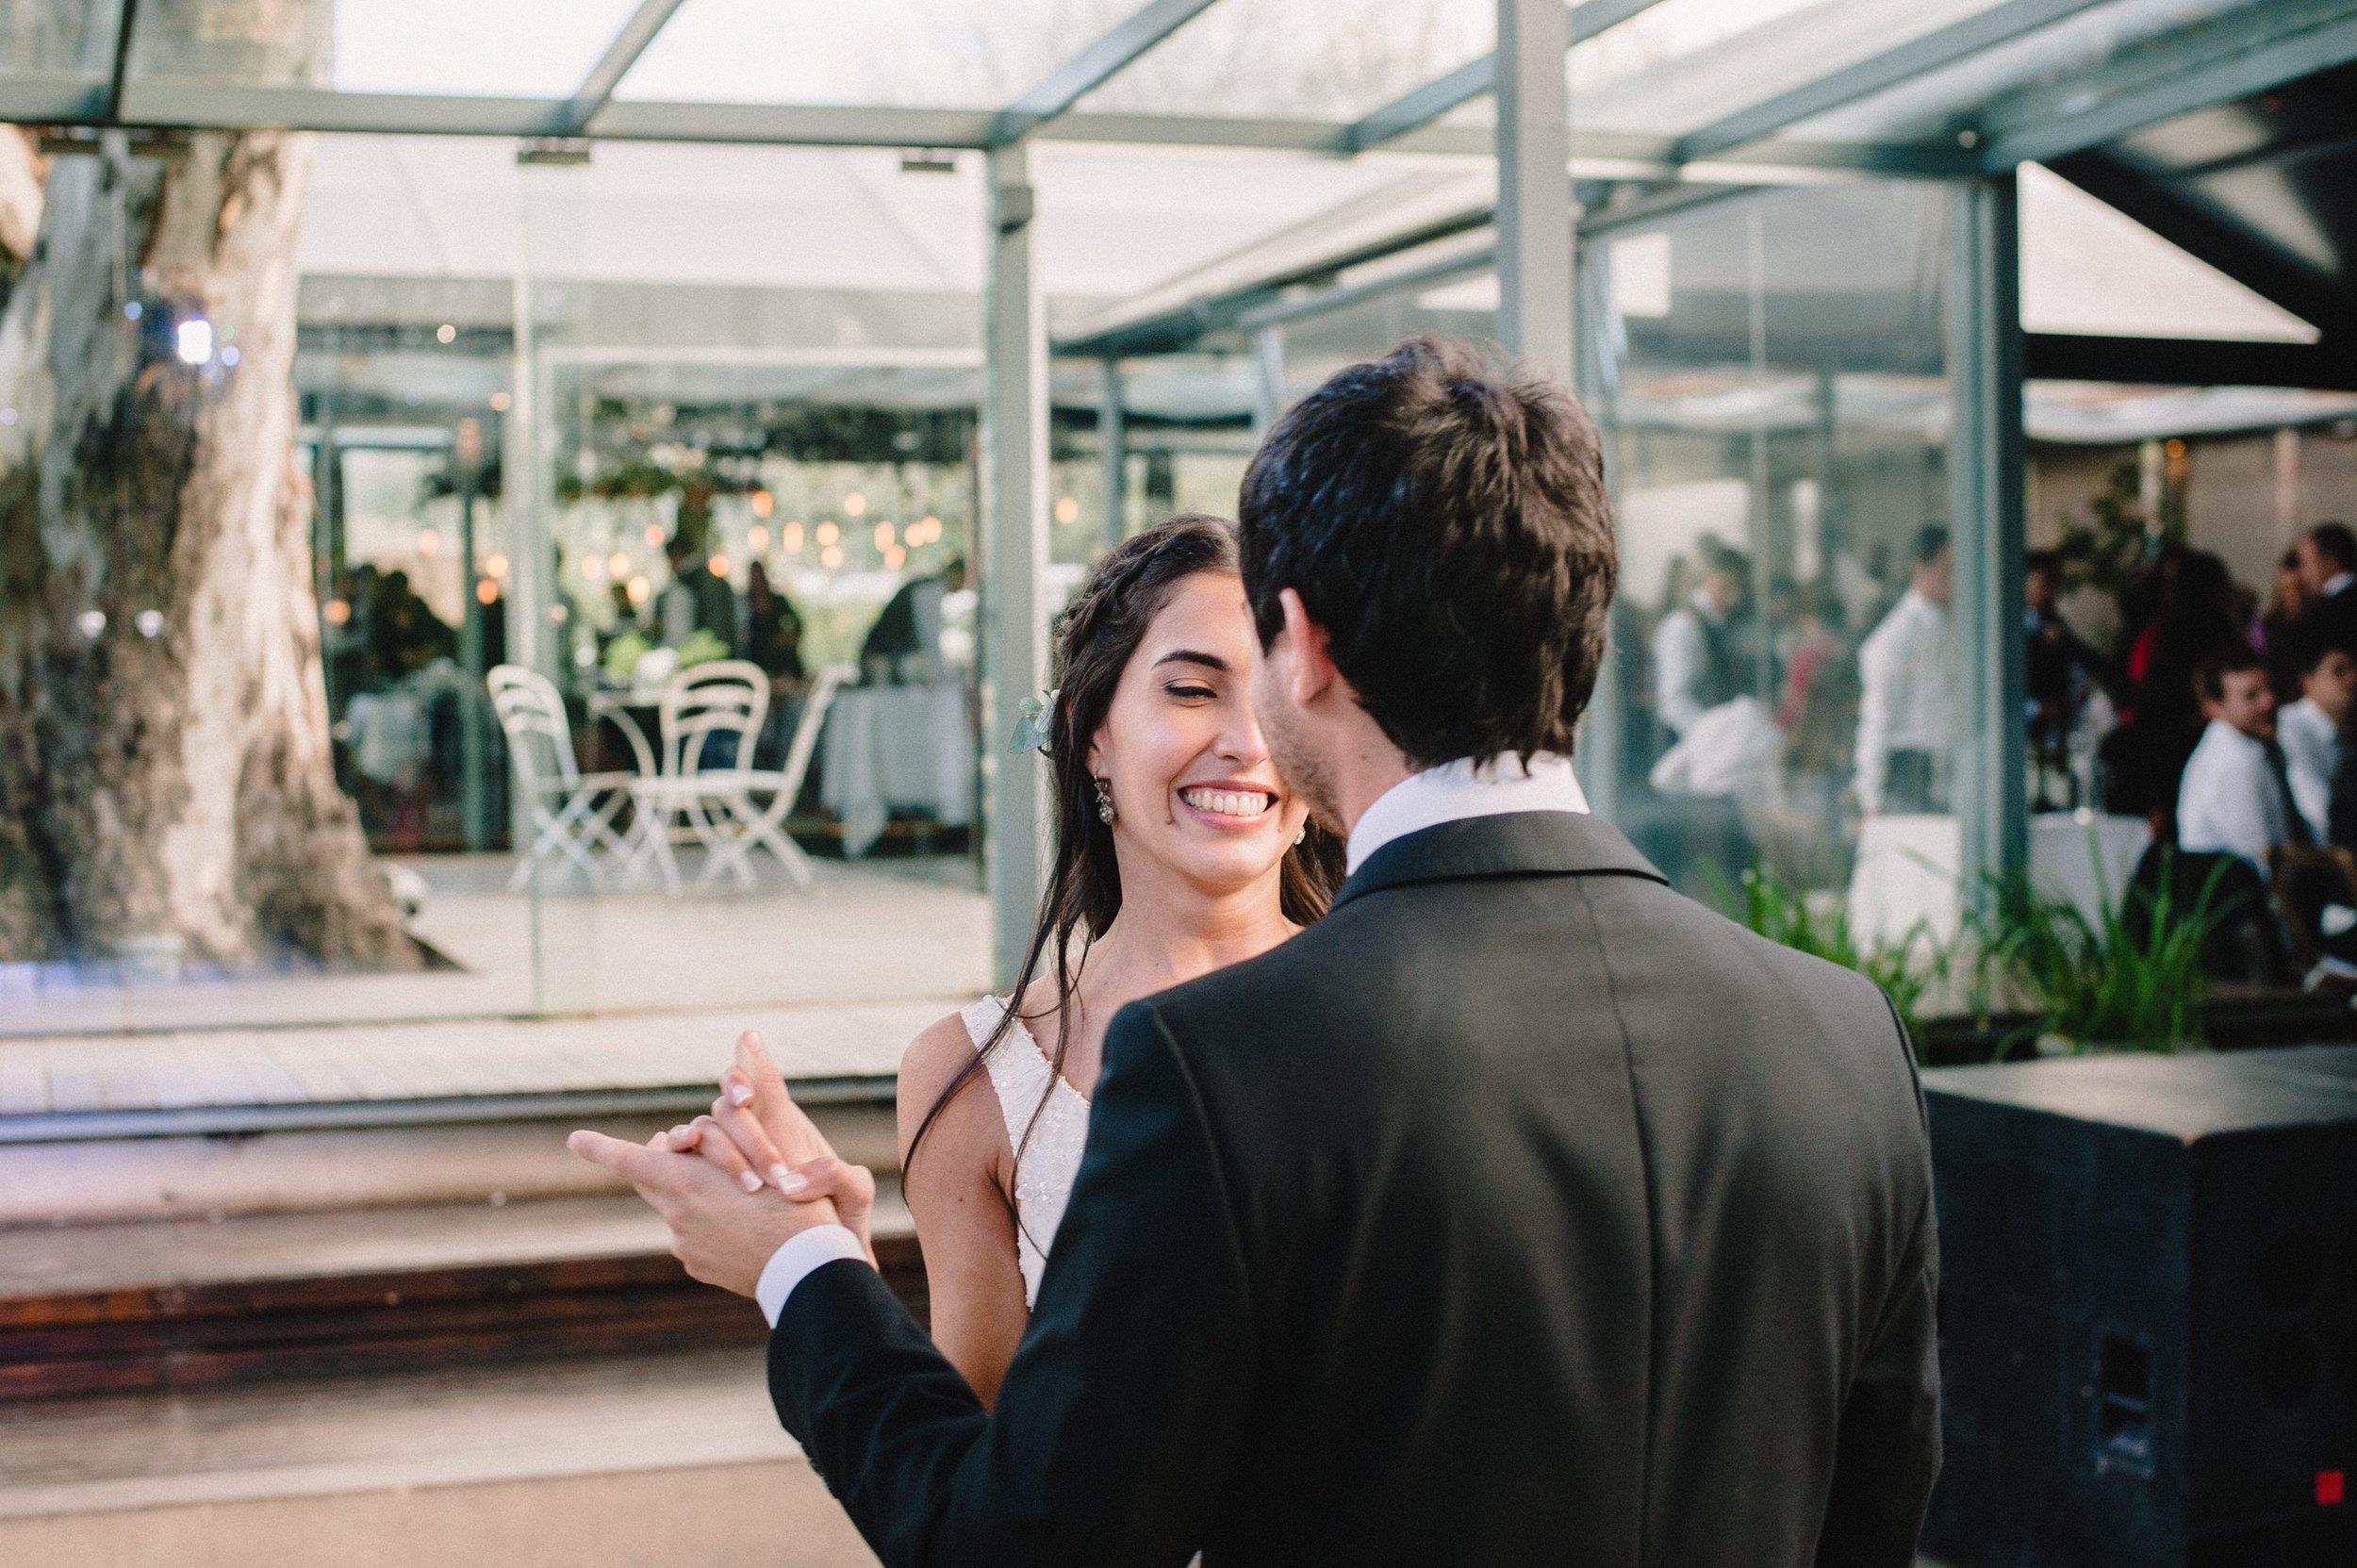 fotografo de bodas en carlos paz cordoba 065.JPG